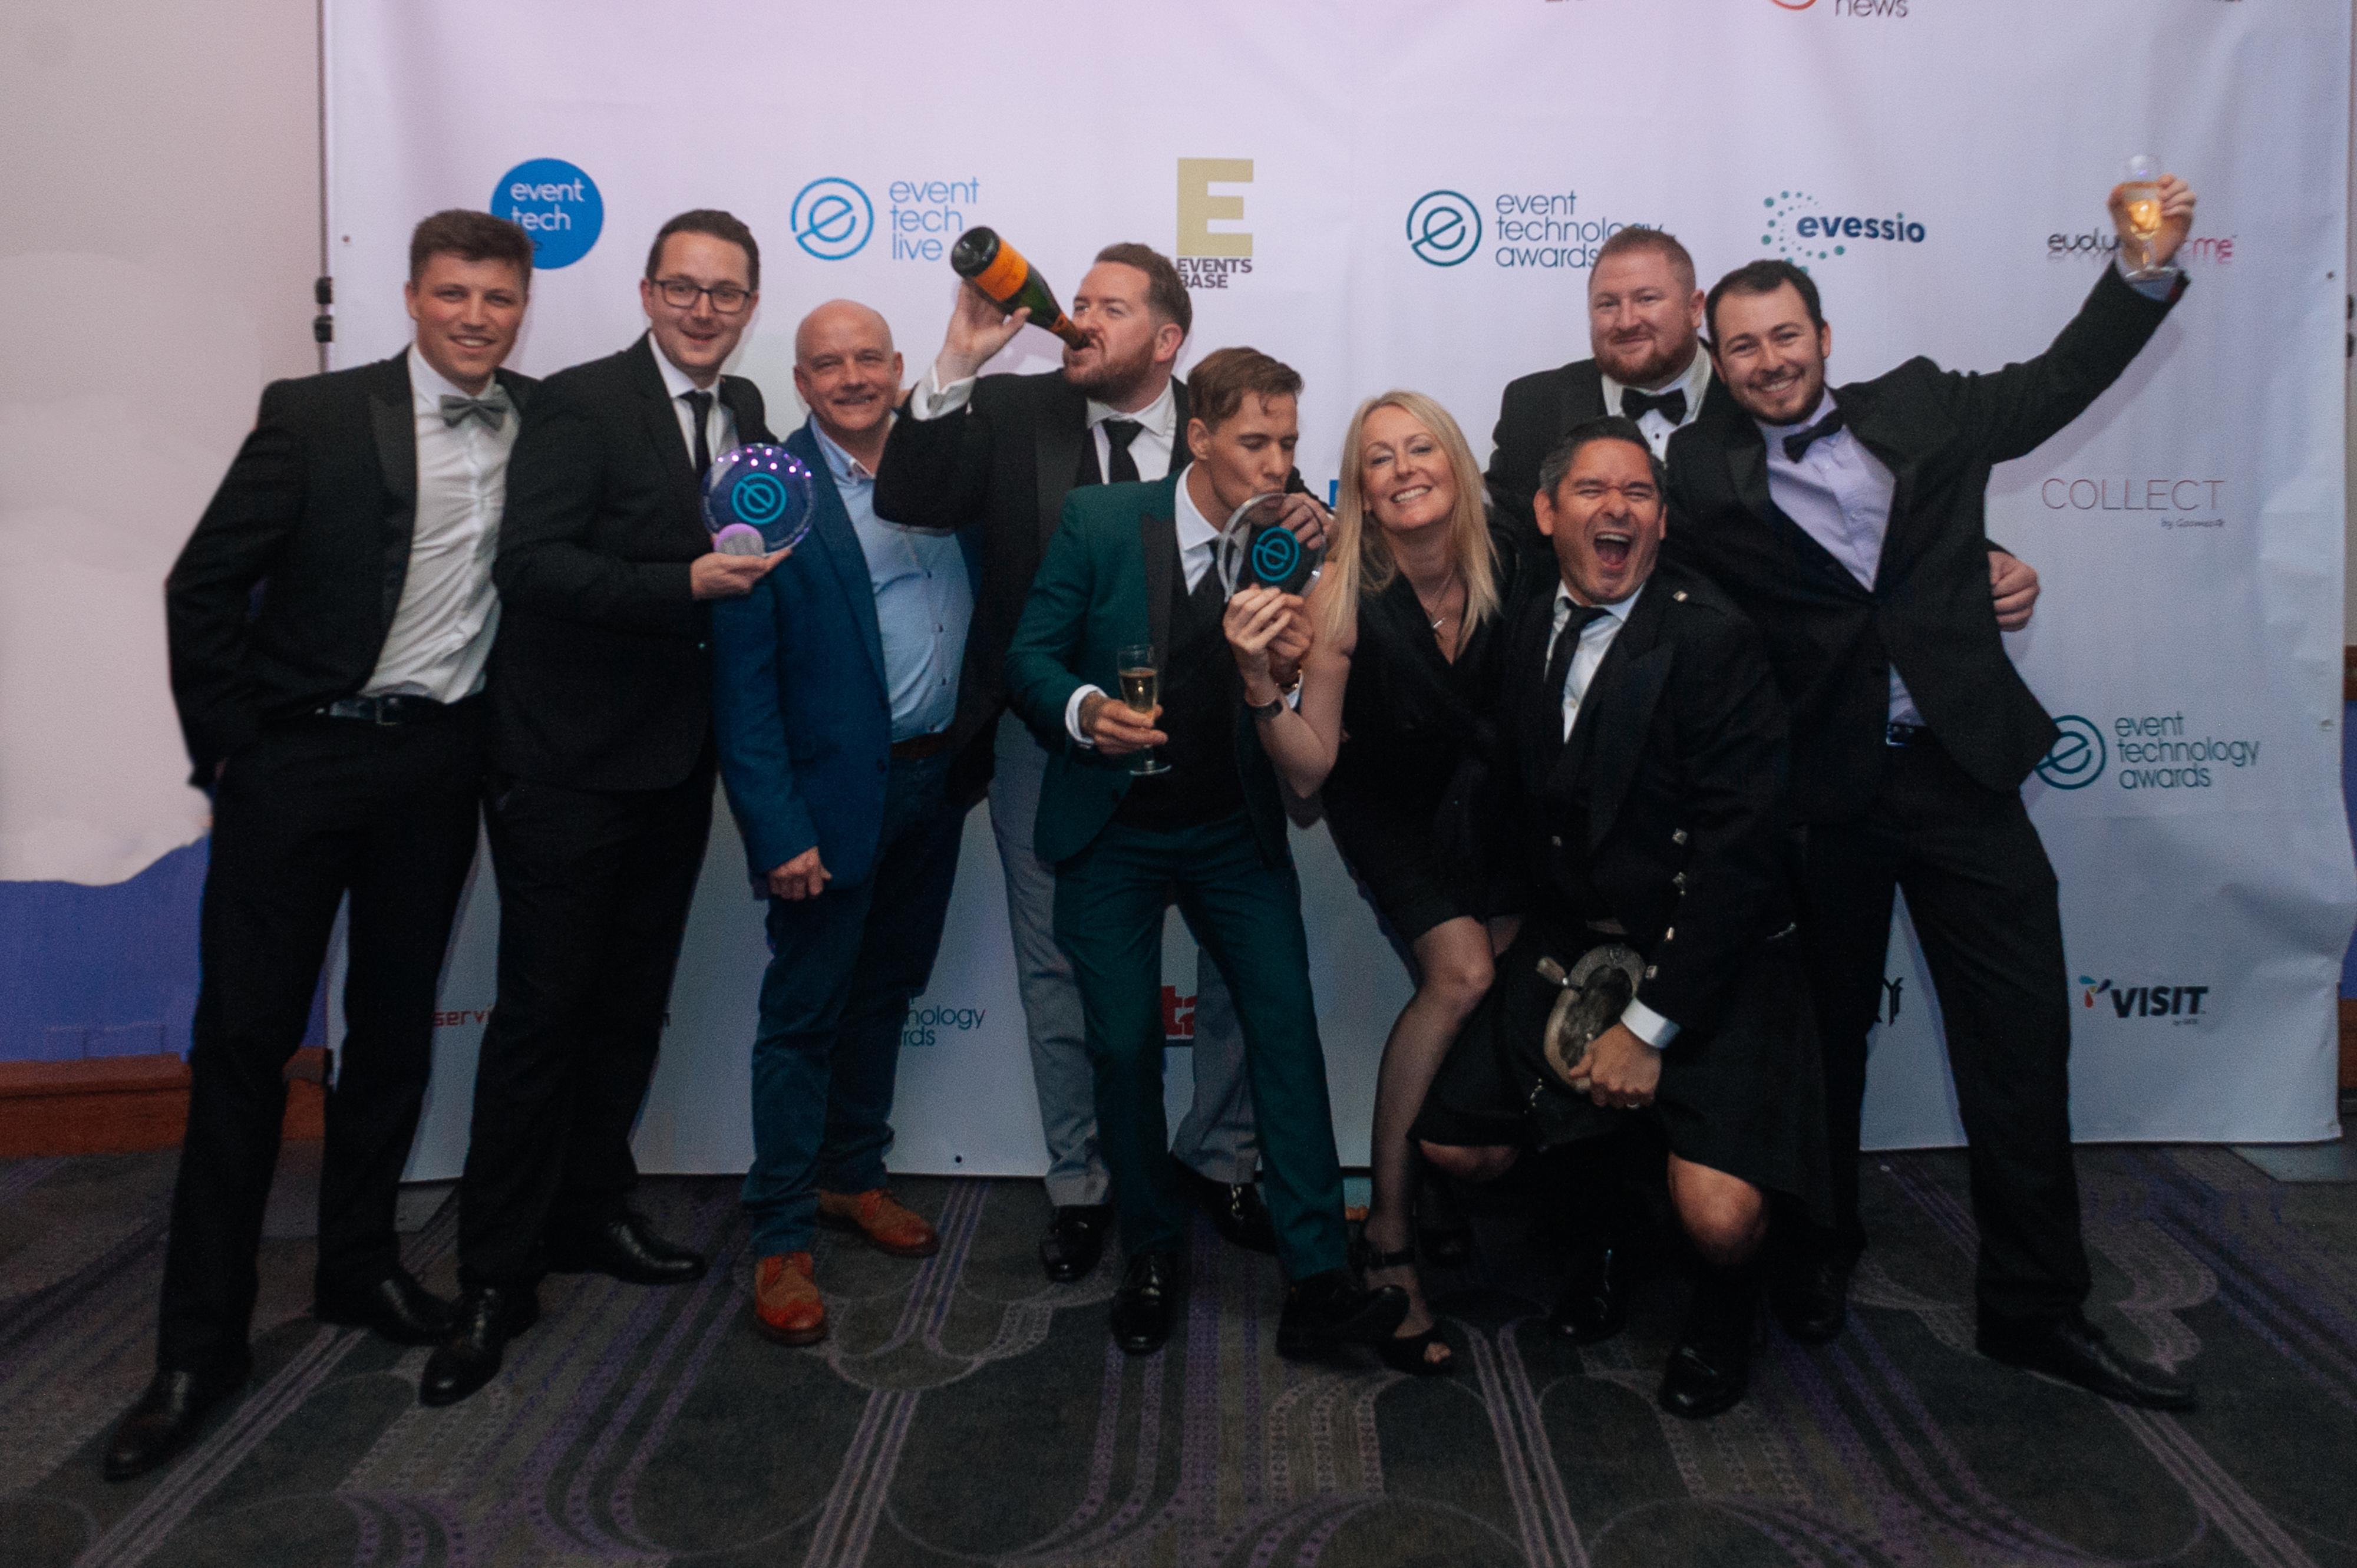 group celebrating event technology award win